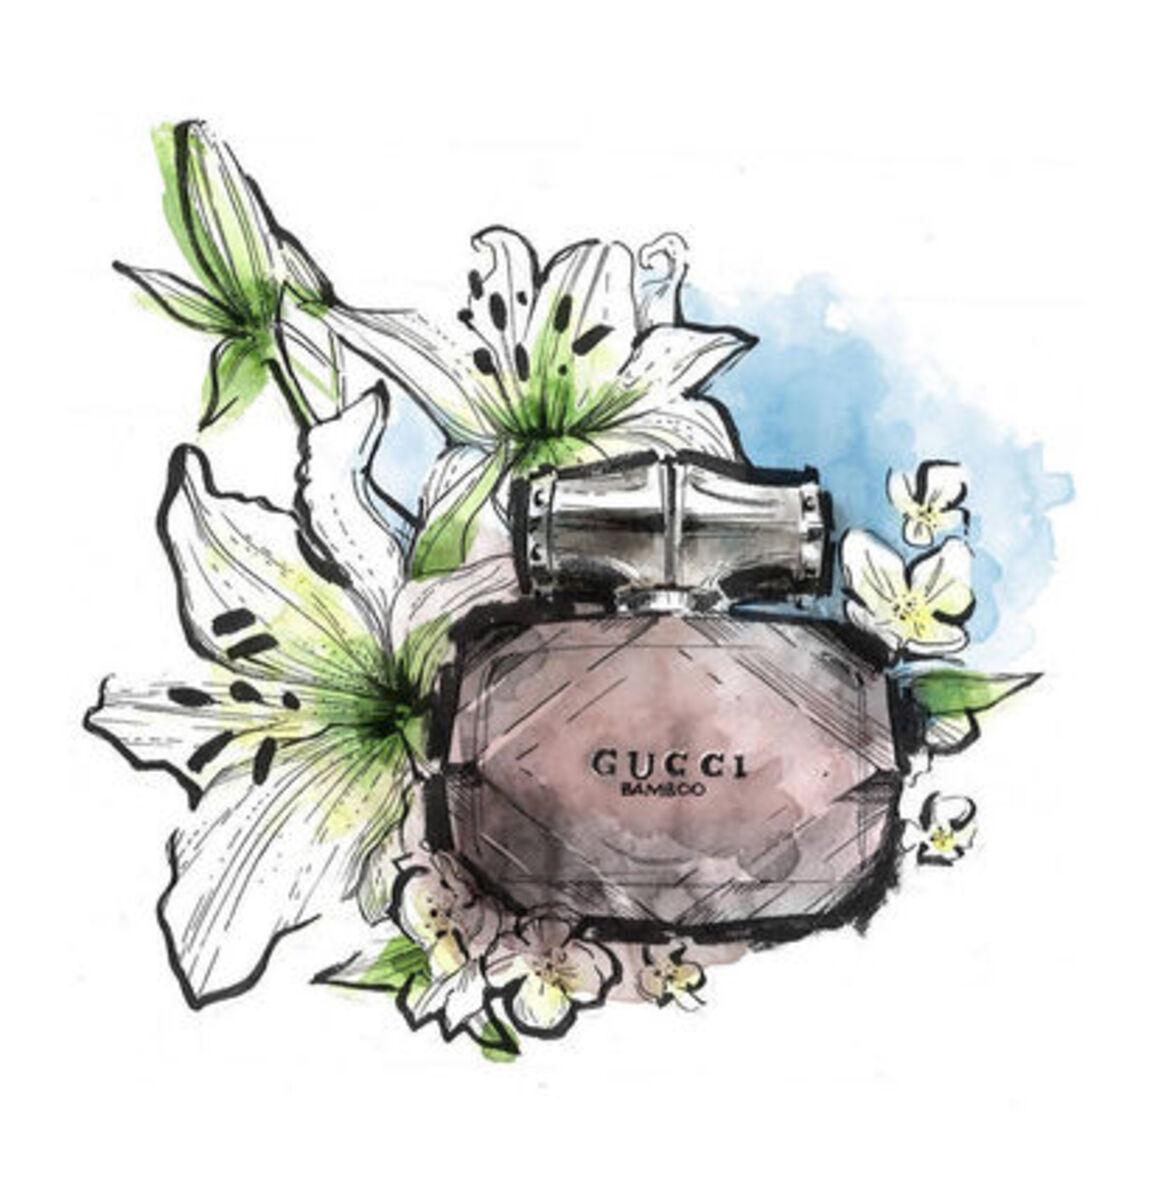 Bild 4 von Gucci Bamboo, Eau de Parfum